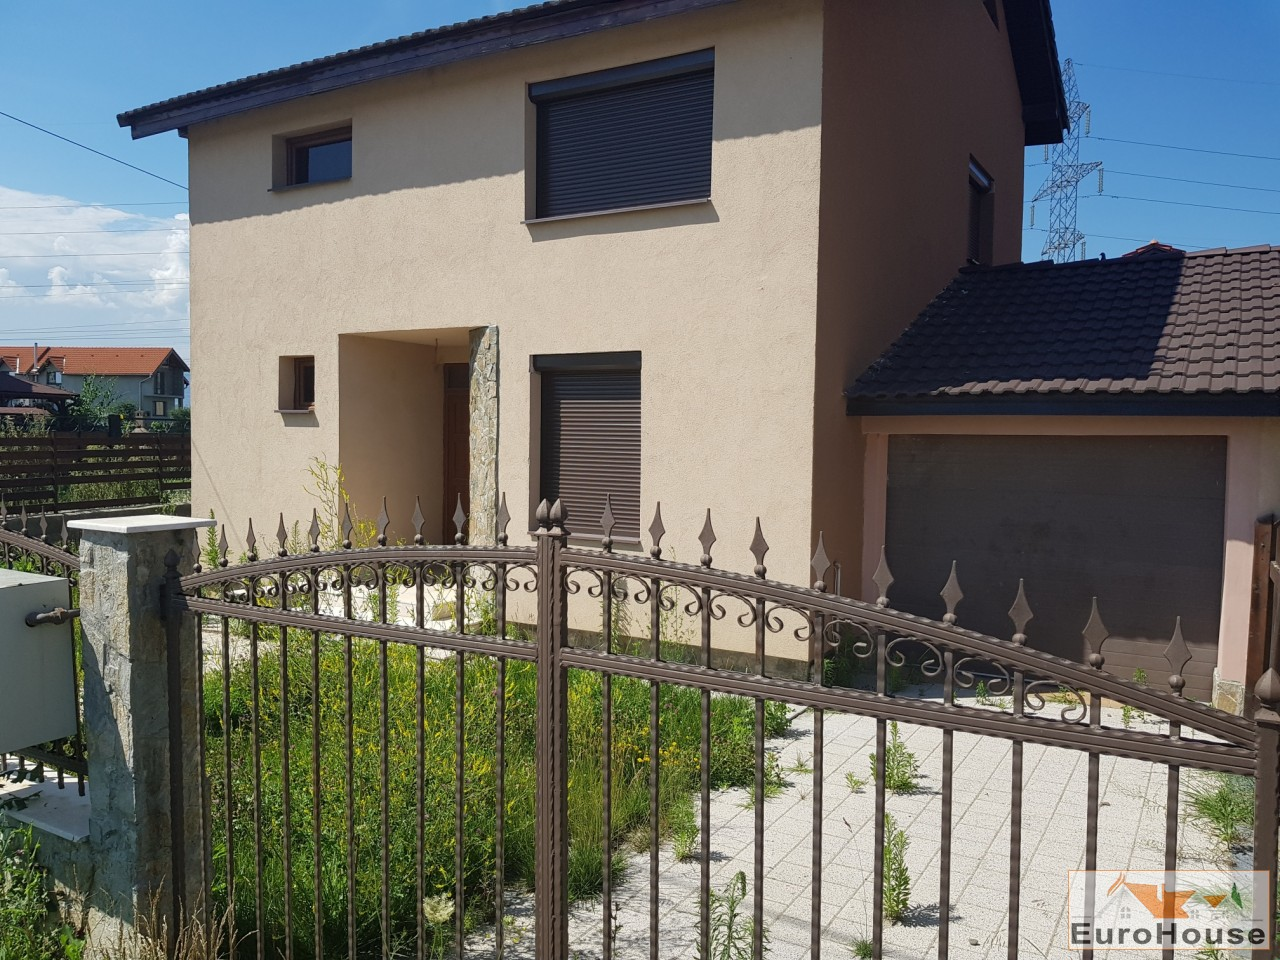 Casa de inchiriat Alba Iulia-33589-